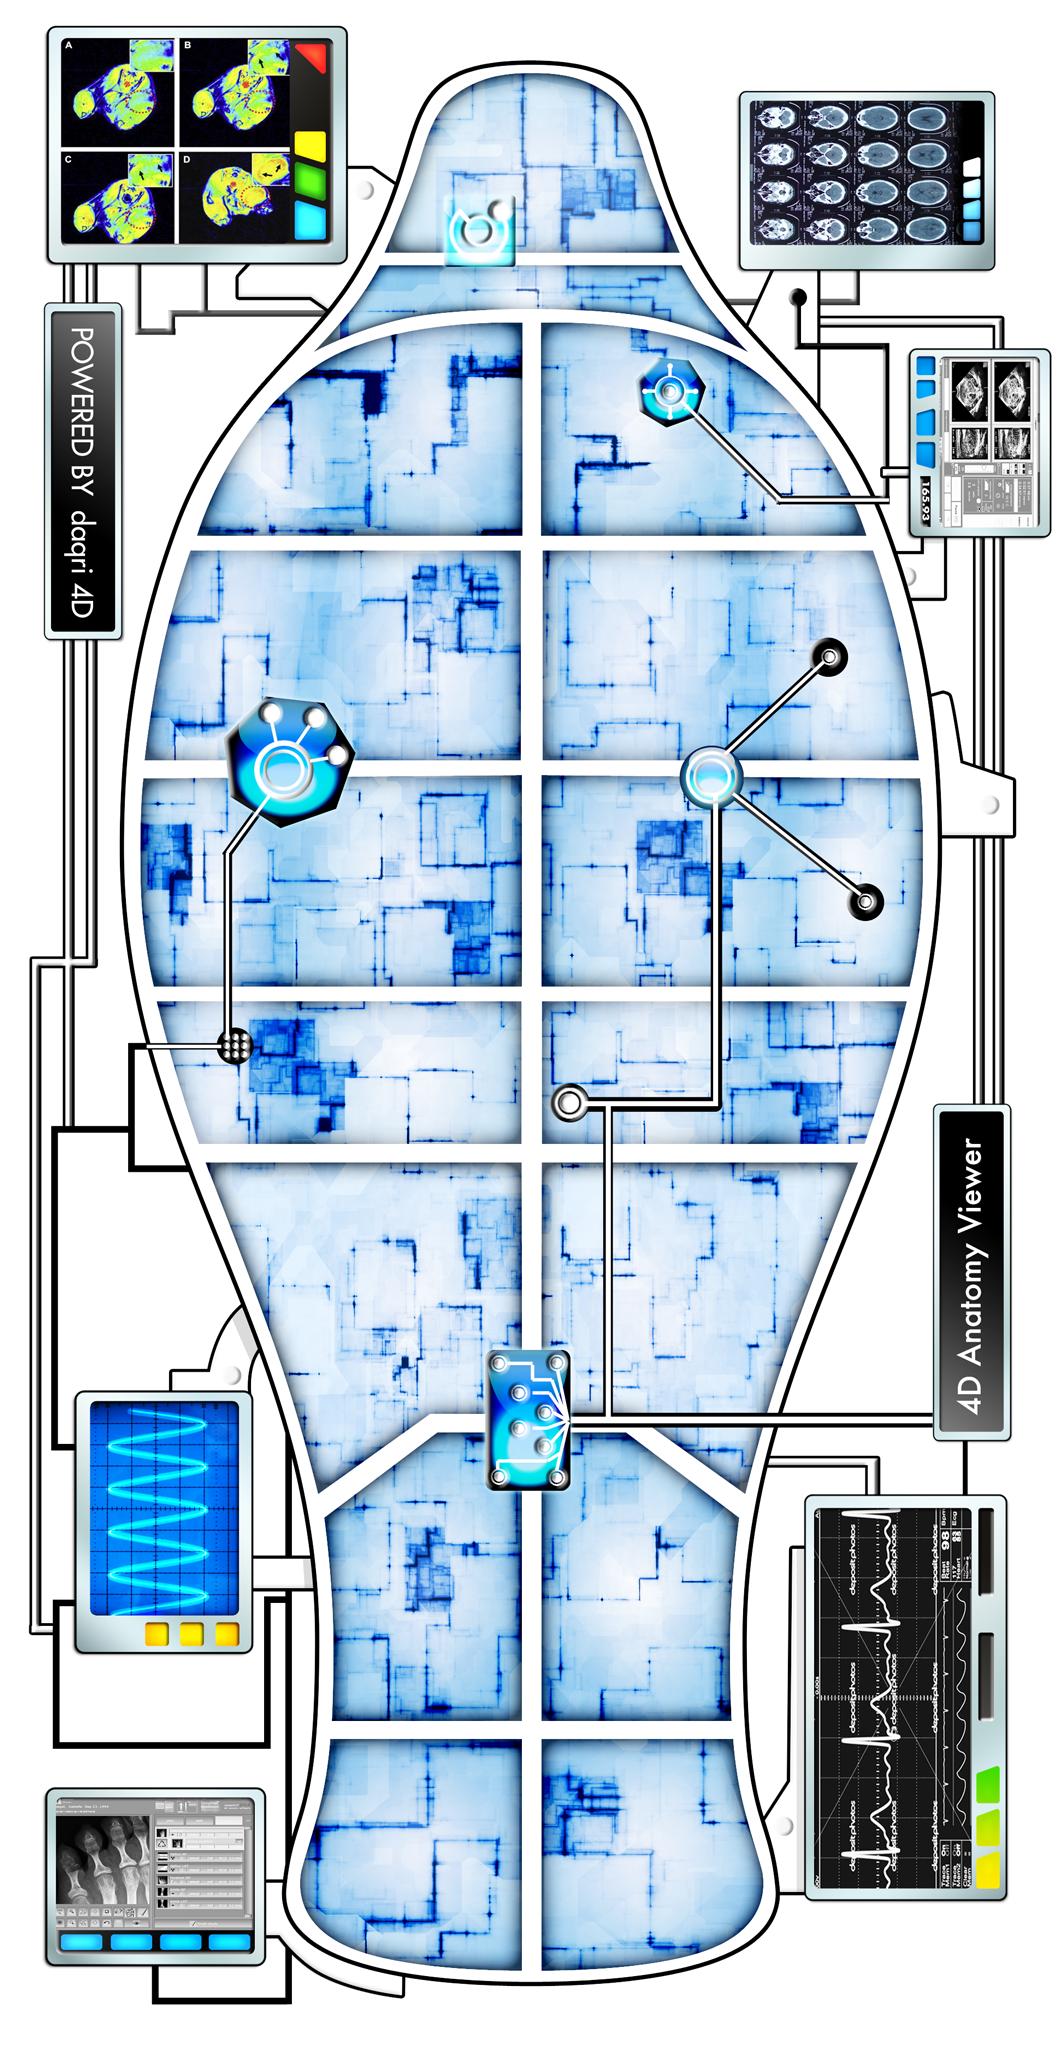 Daqri 4 d human body simulation   Student Sites   Pinterest ...